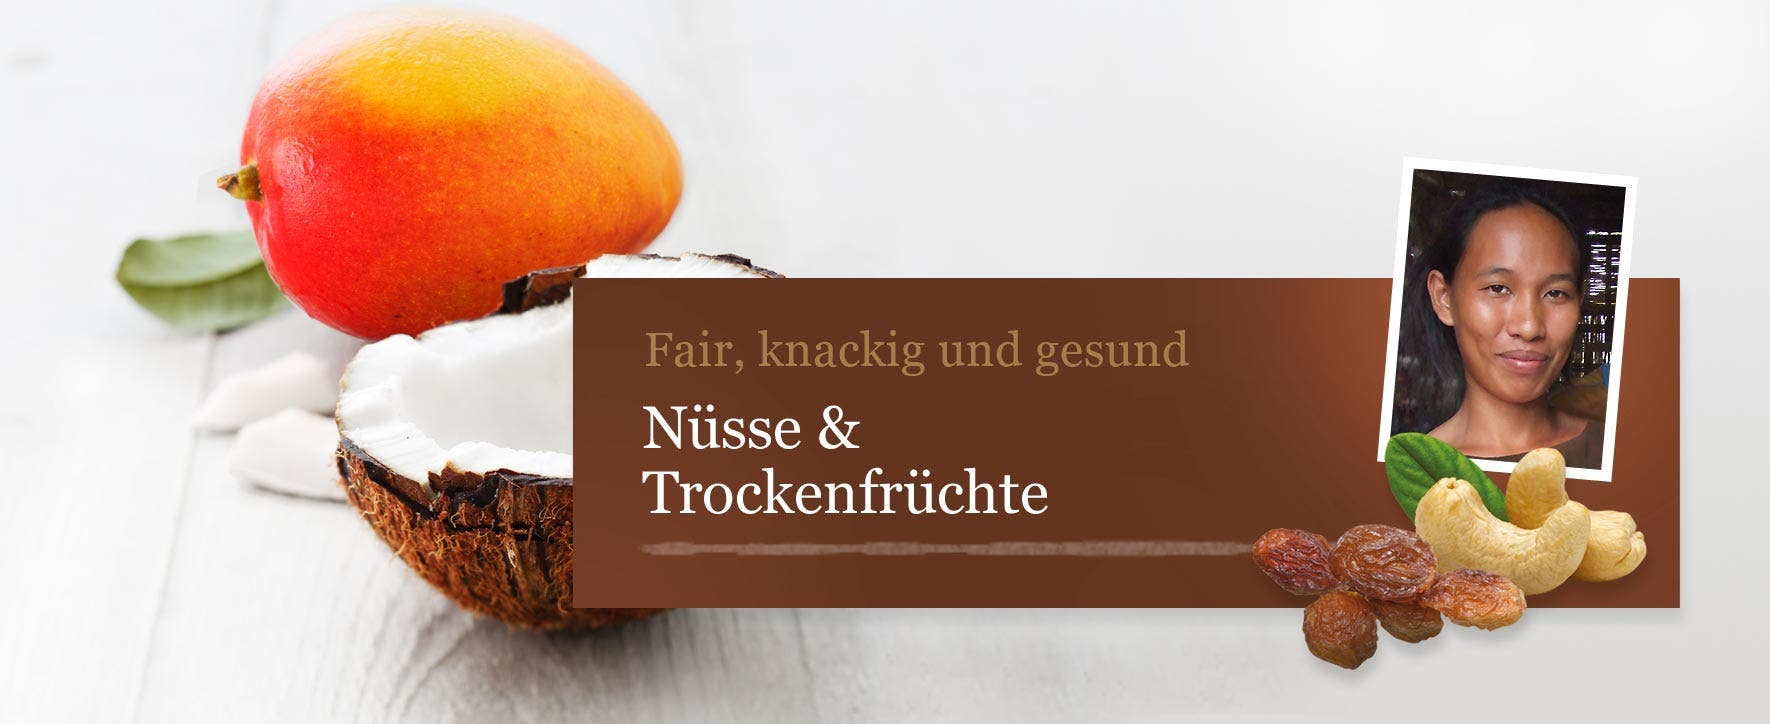 Nüsse & Trockenfrüchte - Foto: GEPA - The Fair Trade Company / Sandra Eckhardt Fotografie